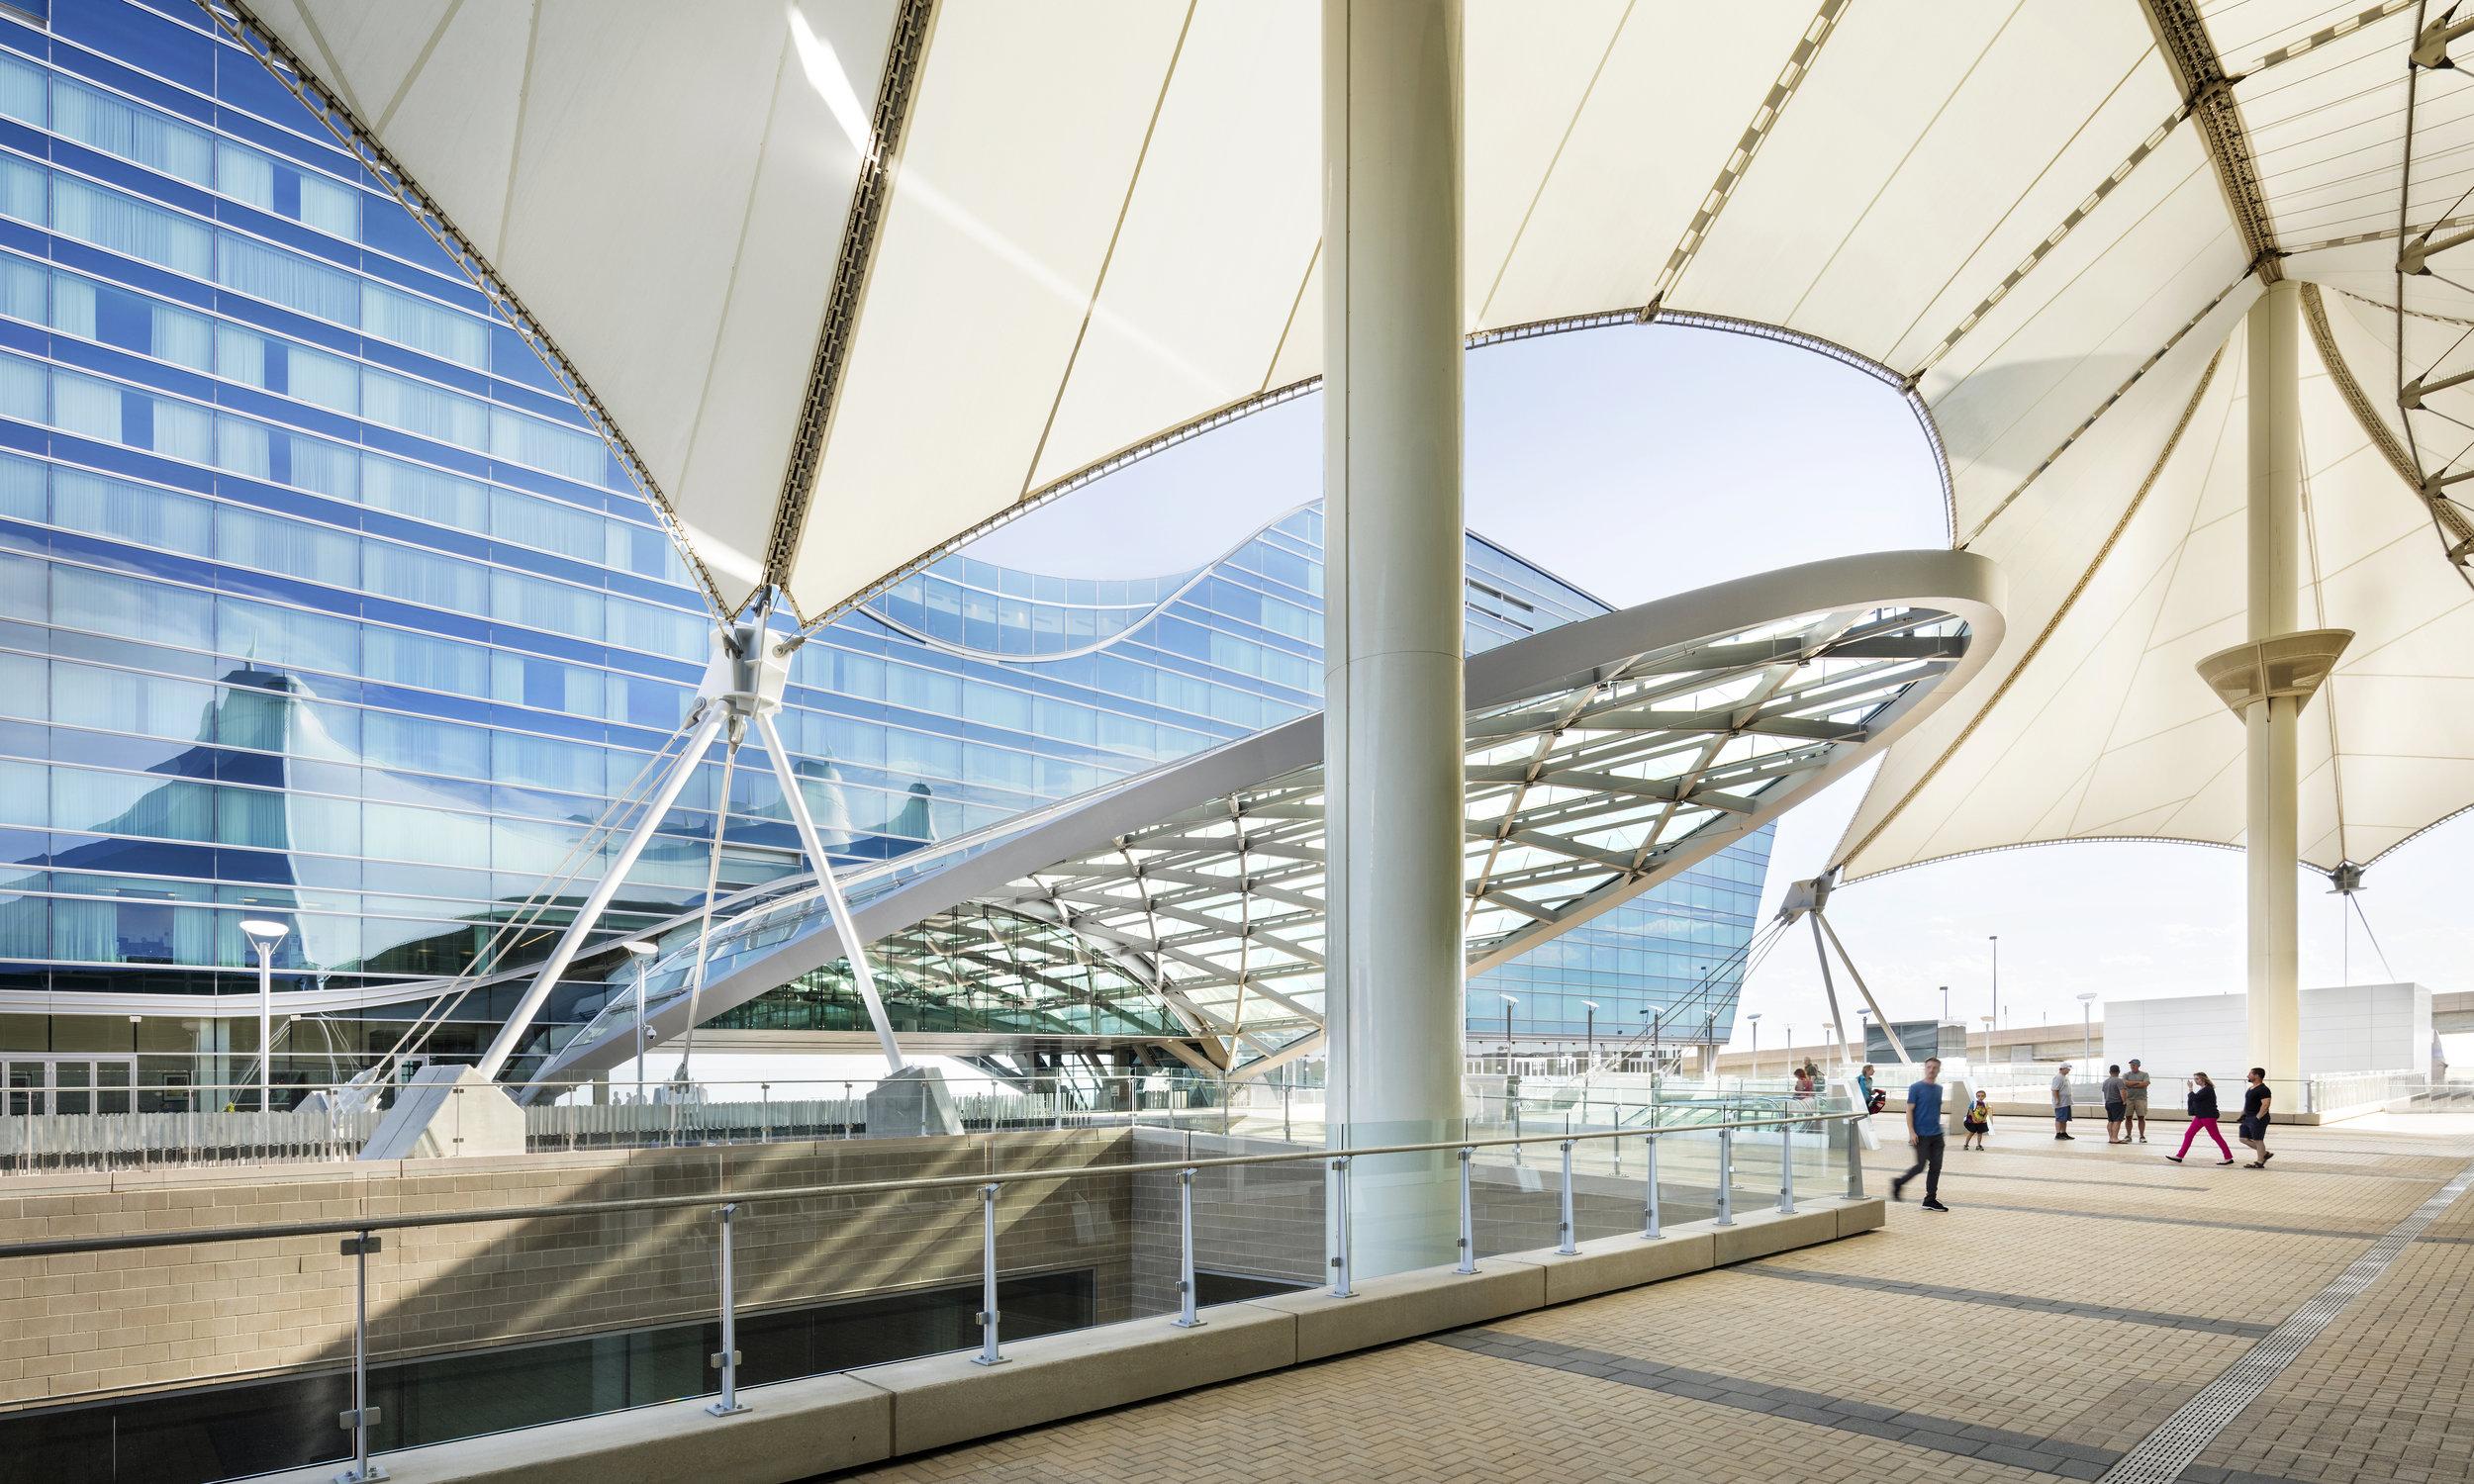 "<img src="" studioINSITE_WestinDEN_Plaza_Architecture2 ""alt=""Denver International Airport, DIA, Denver, CO, Colorado, Airport, Art, Hotel, Transit, Light Rail, Events, Arts, Sculpture, Plaza, Transportation, Terminal, Hub  ""title=""Denver International Airport - Westin Hotel Plaza  ""/>"